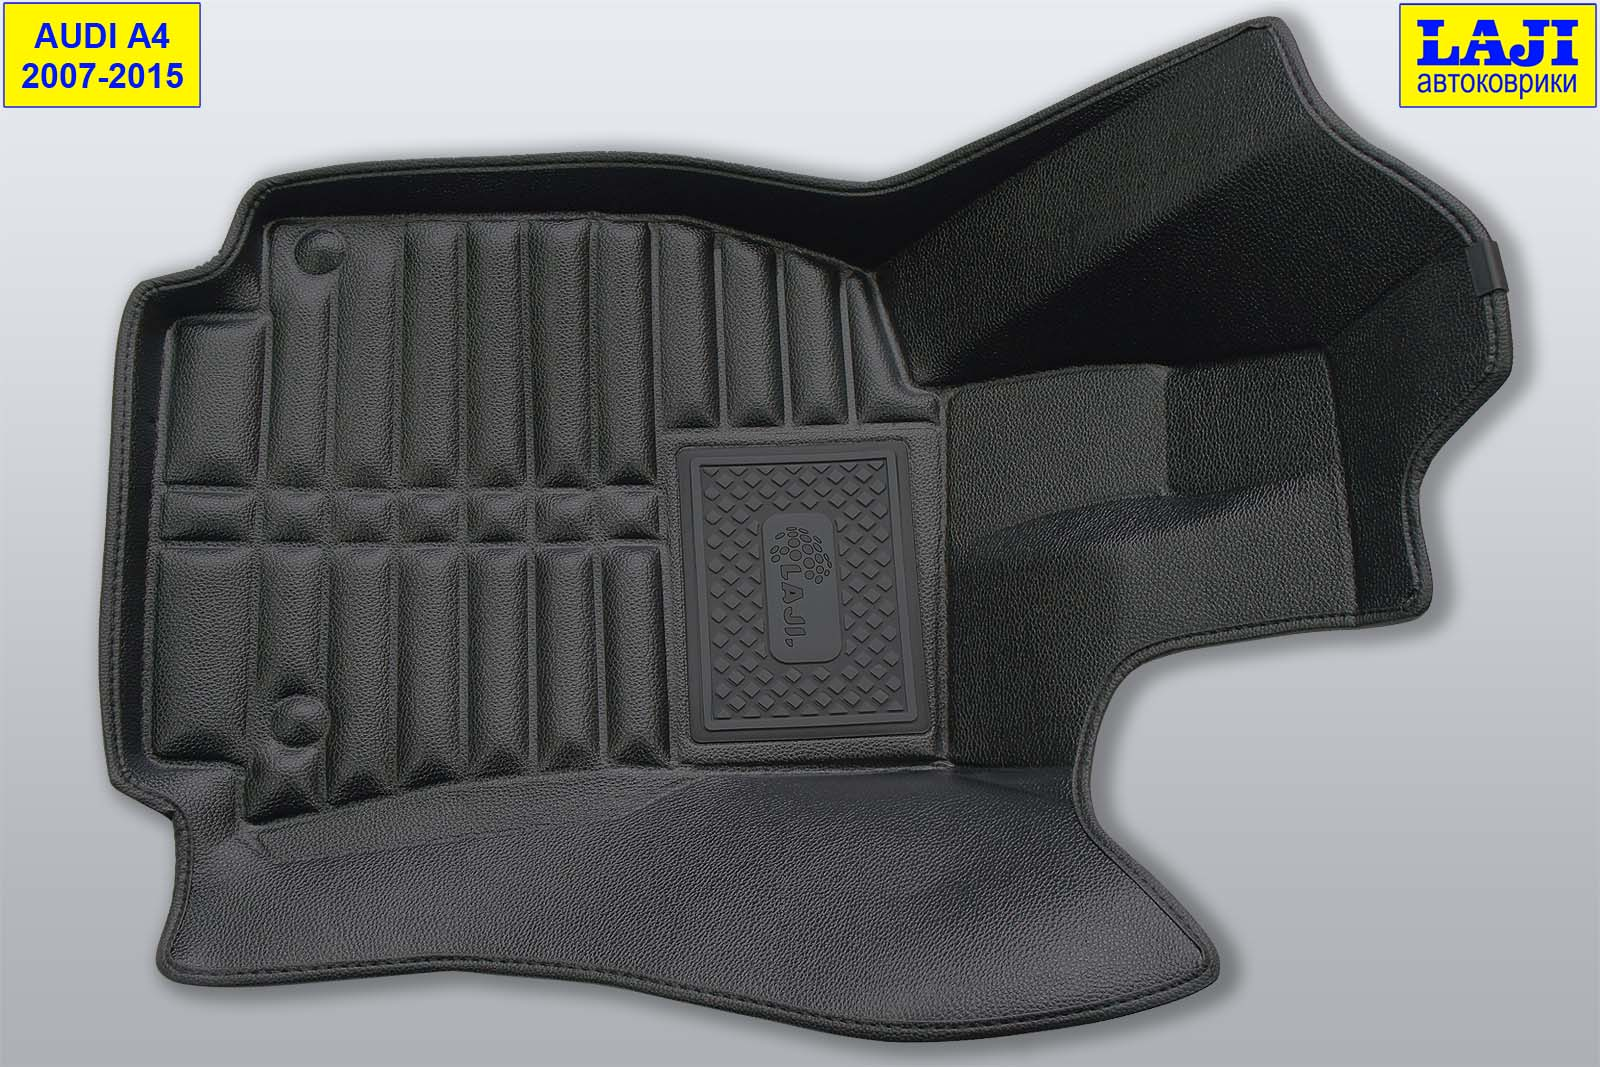 5D коврики для Audi A4 B8 2007-2015 2